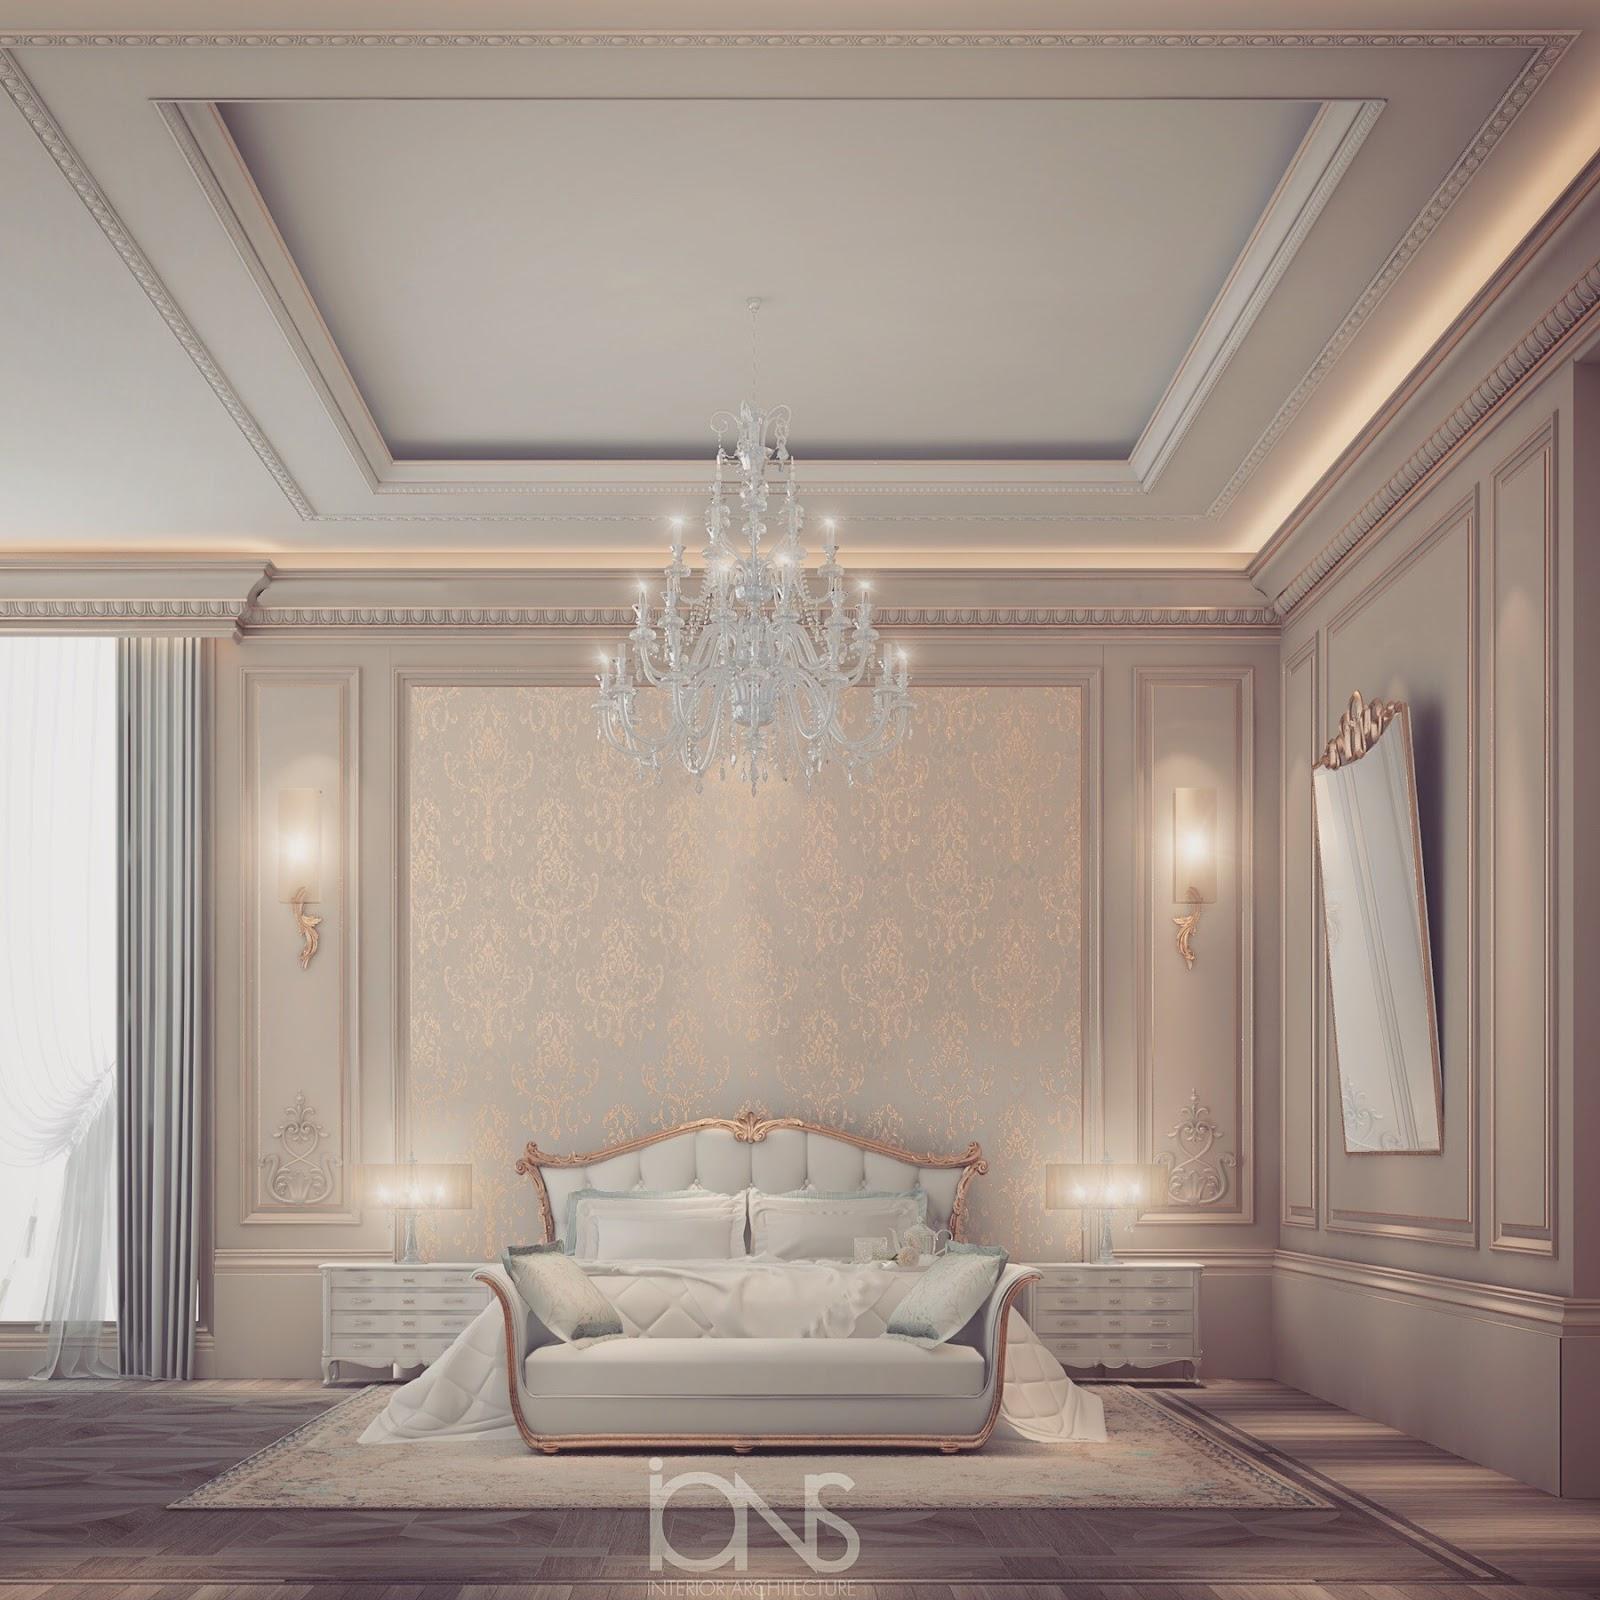 DUBAI INTERIOR DESIGN COMPANY | INTERIOR DESIGN IDEAS FOR ...